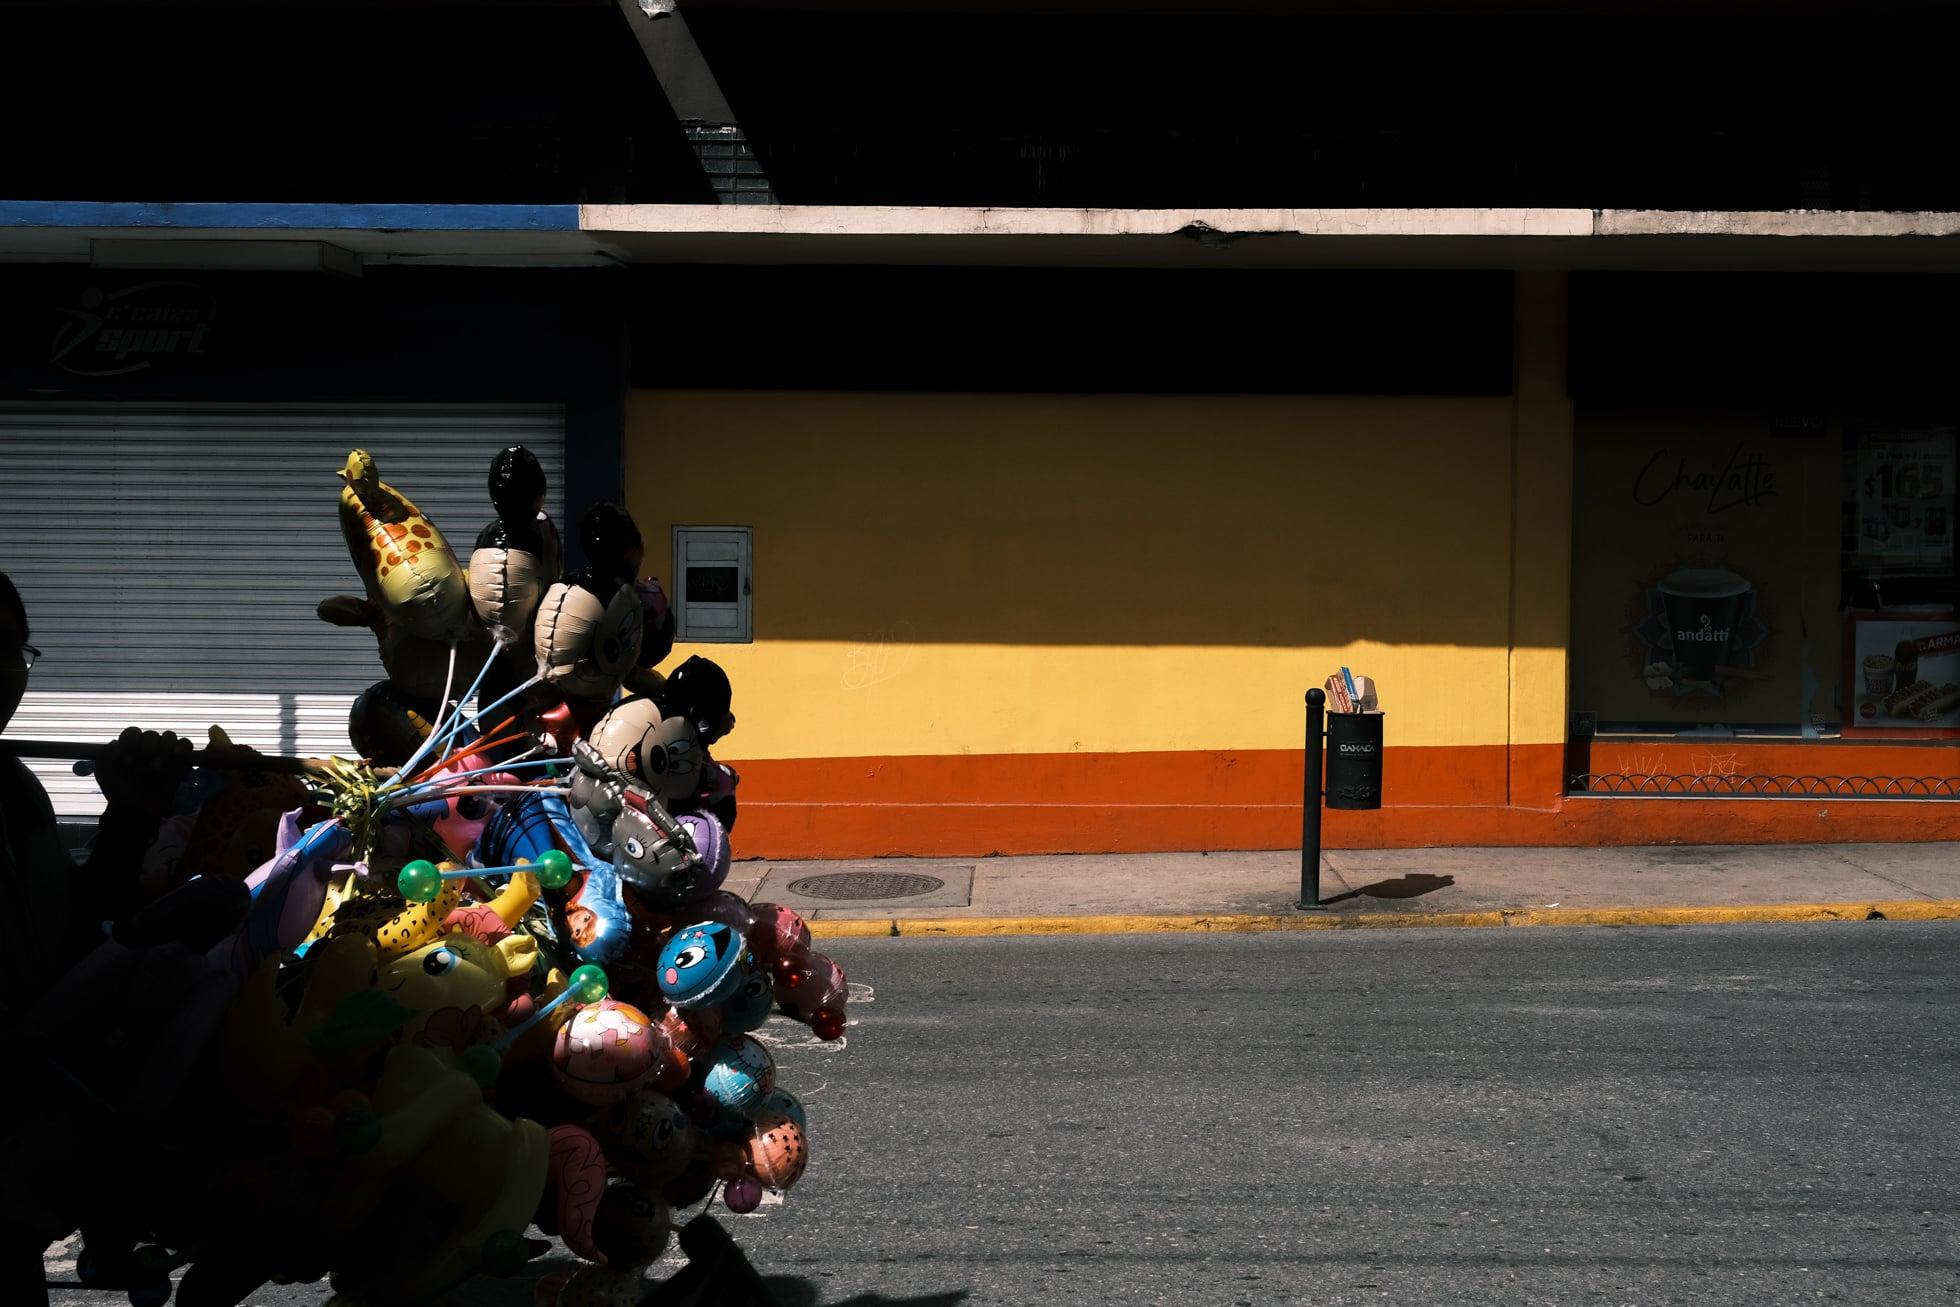 fujifilm-x-pro3-mexico-street-photography-26